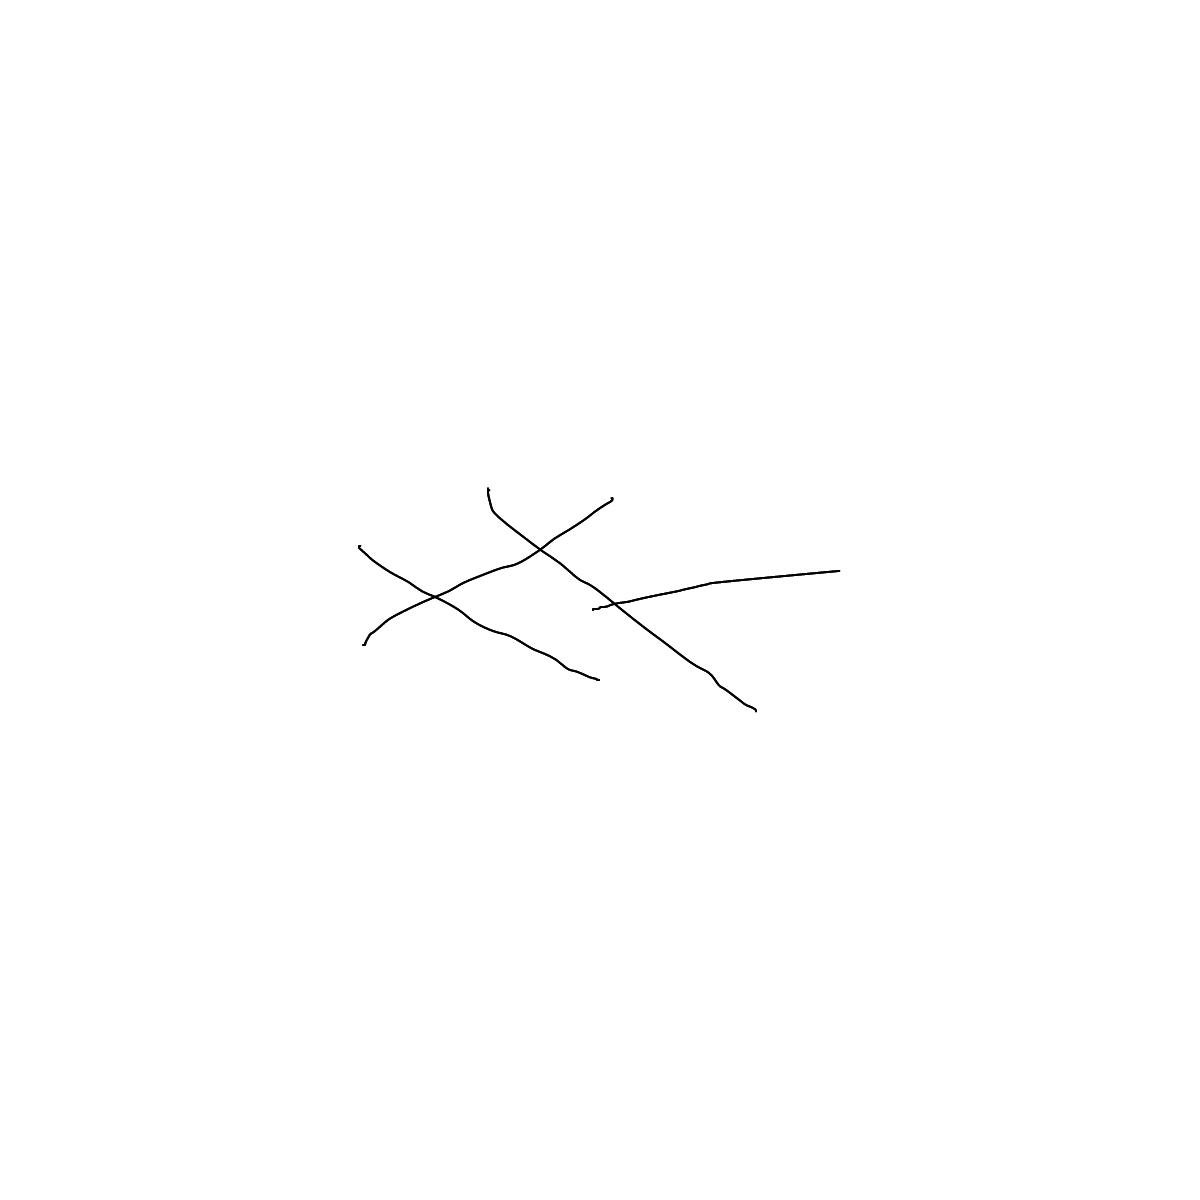 BAAAM drawing#1527 lat:51.1555480957031250lng: 16.9696674346923830